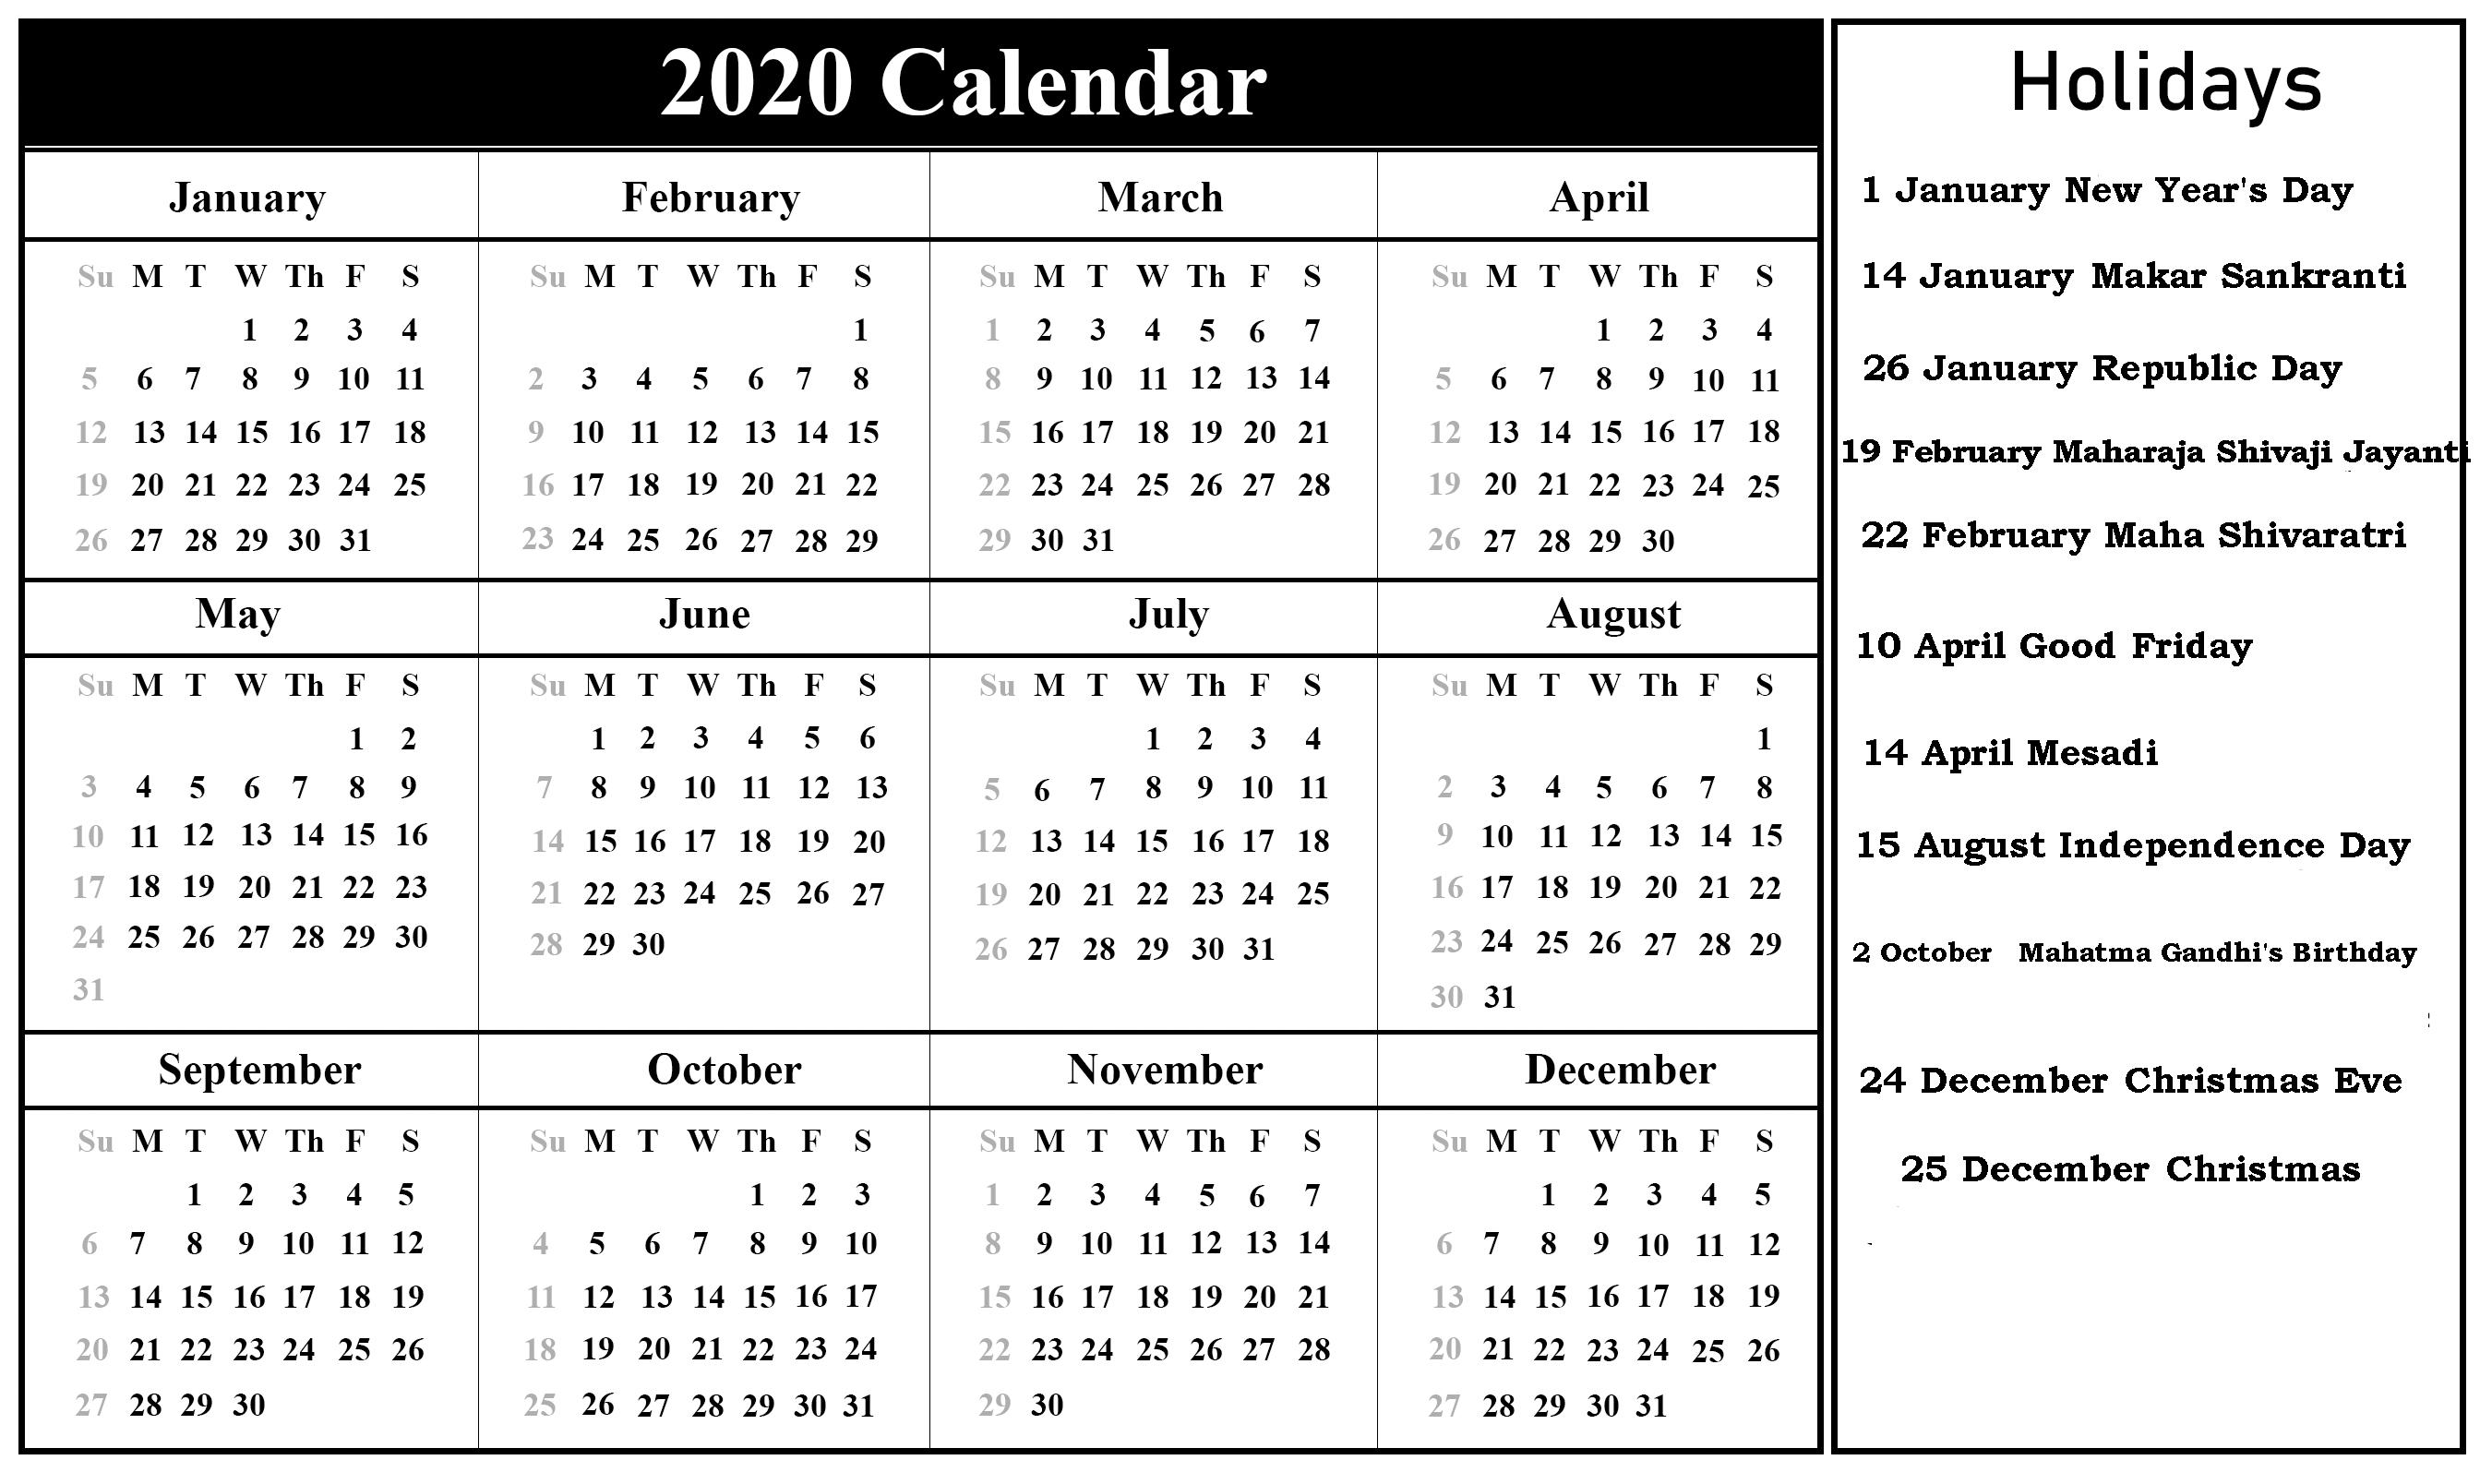 Printable Indian 2020 Calendar Template Pdf, Excel, Word